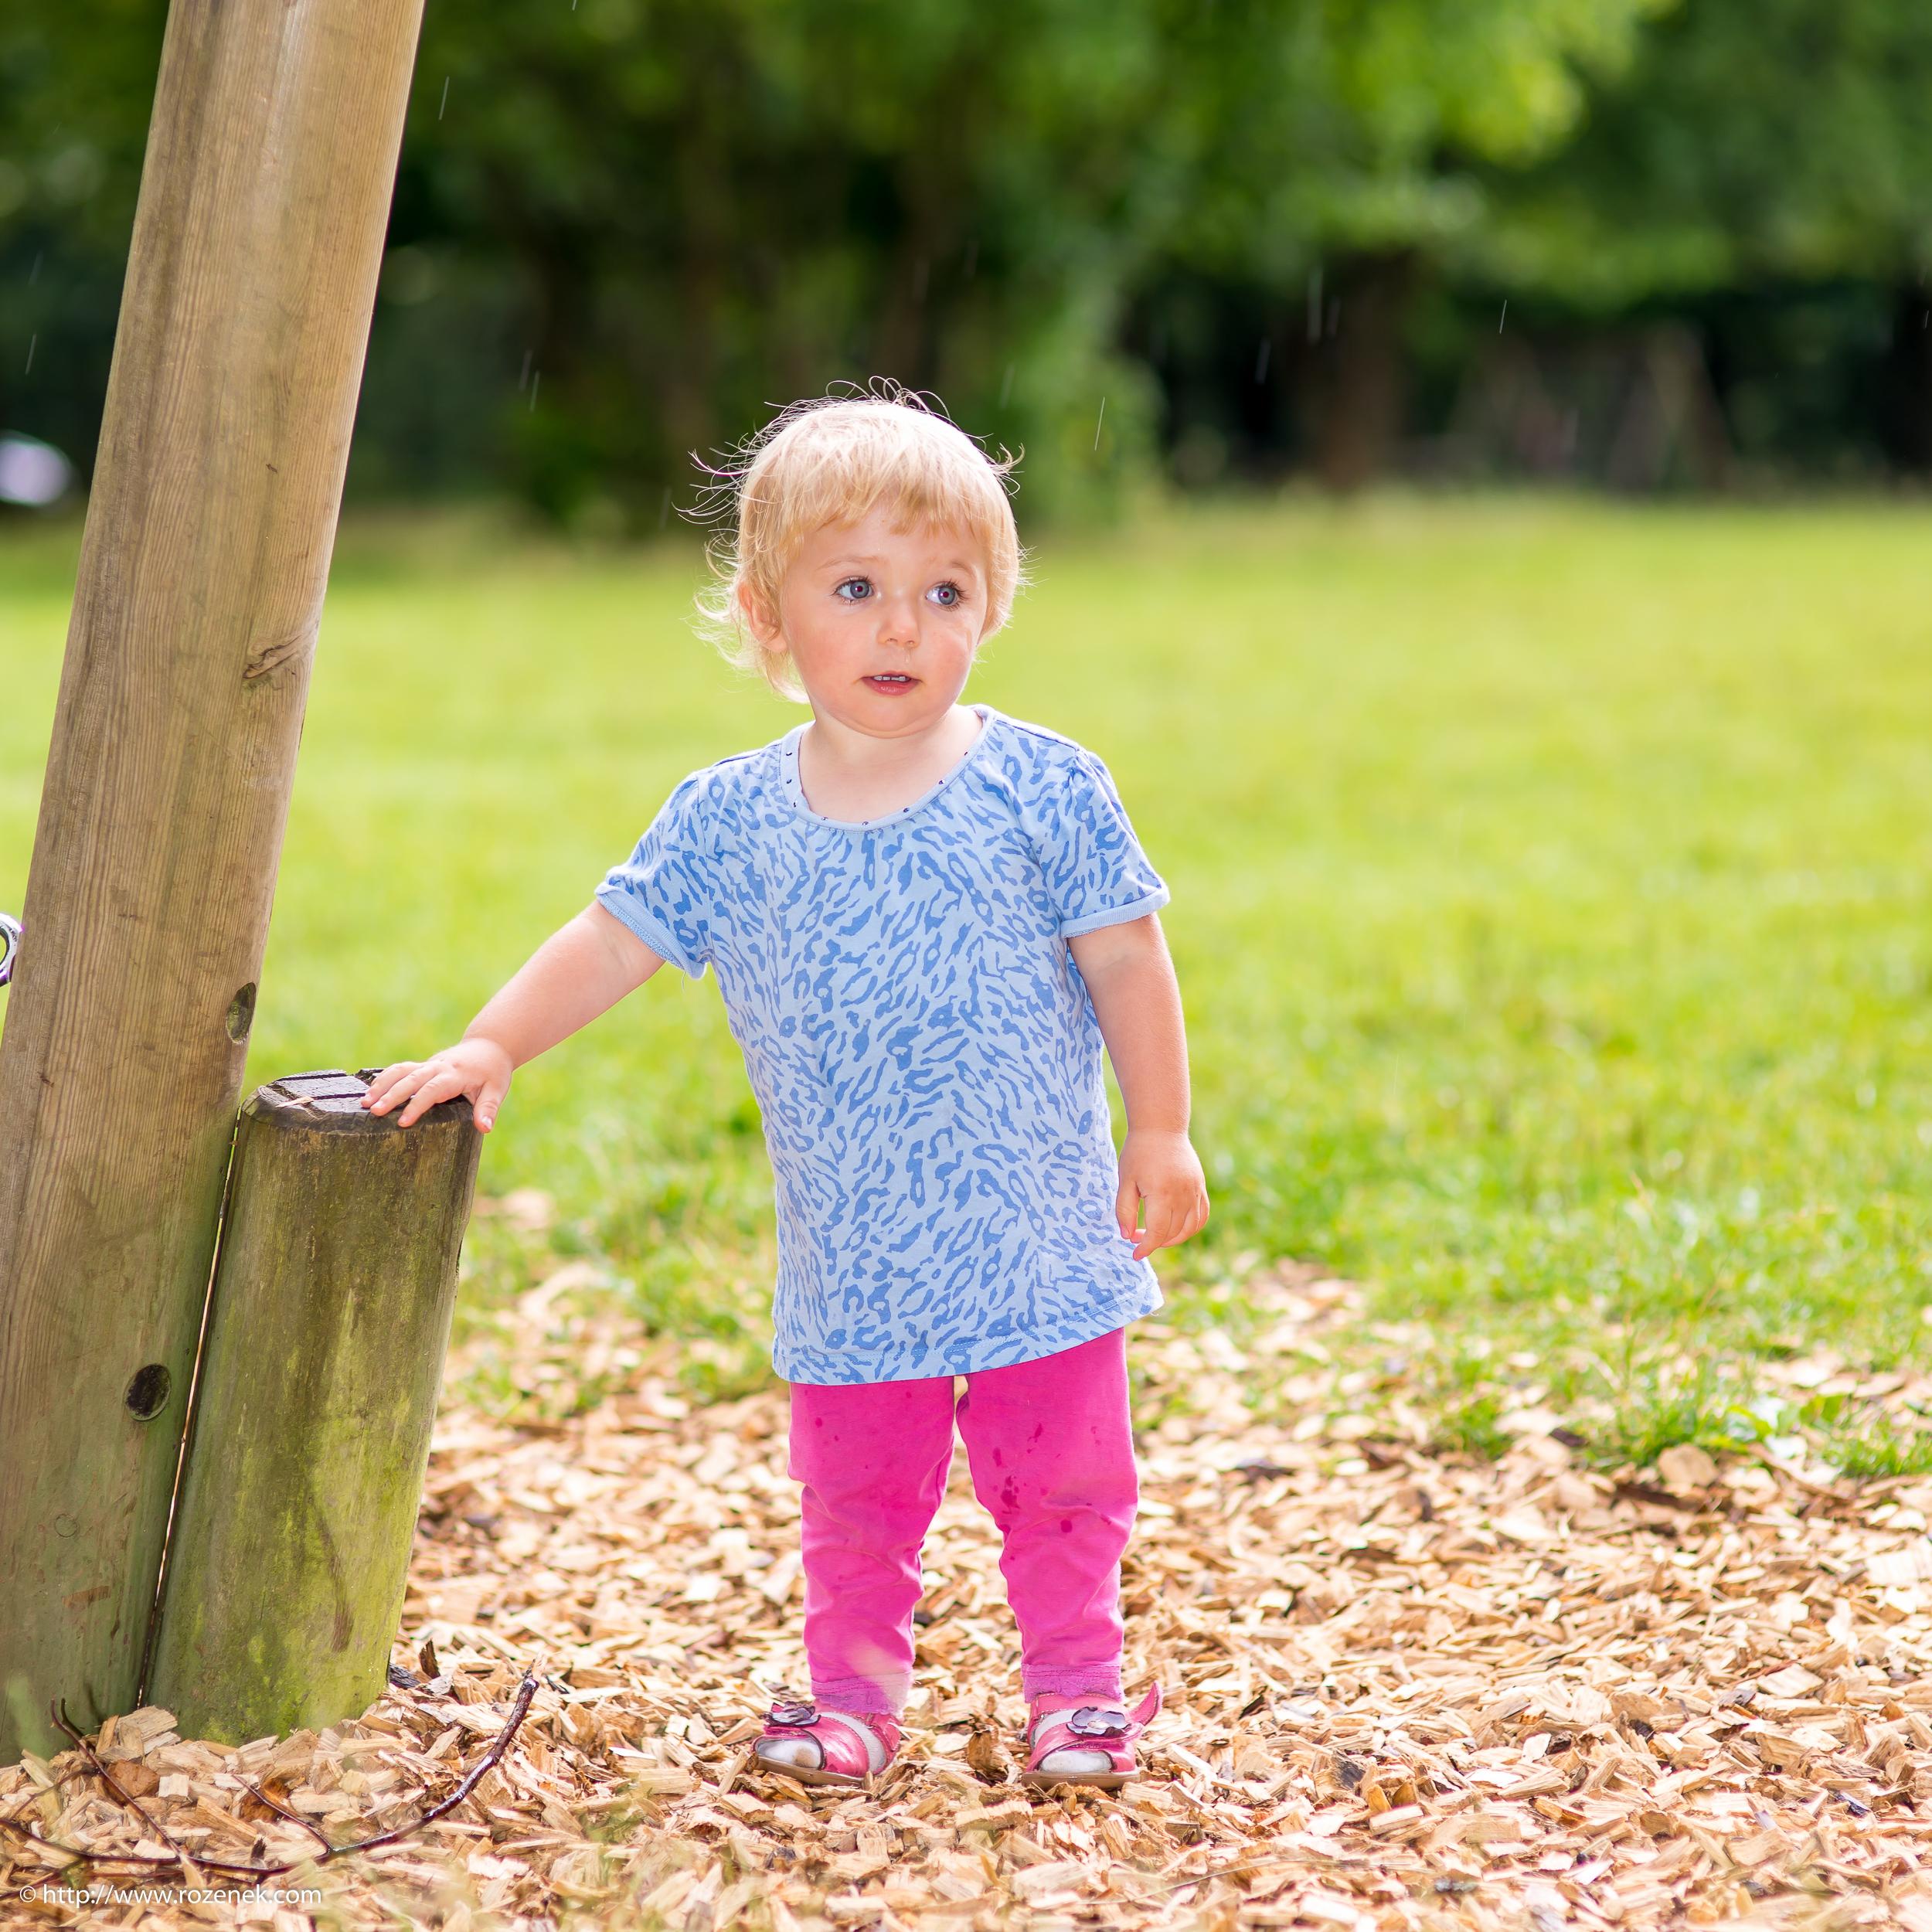 2016.08.05 - Karina at Queen Elizabeth Country Park - 03